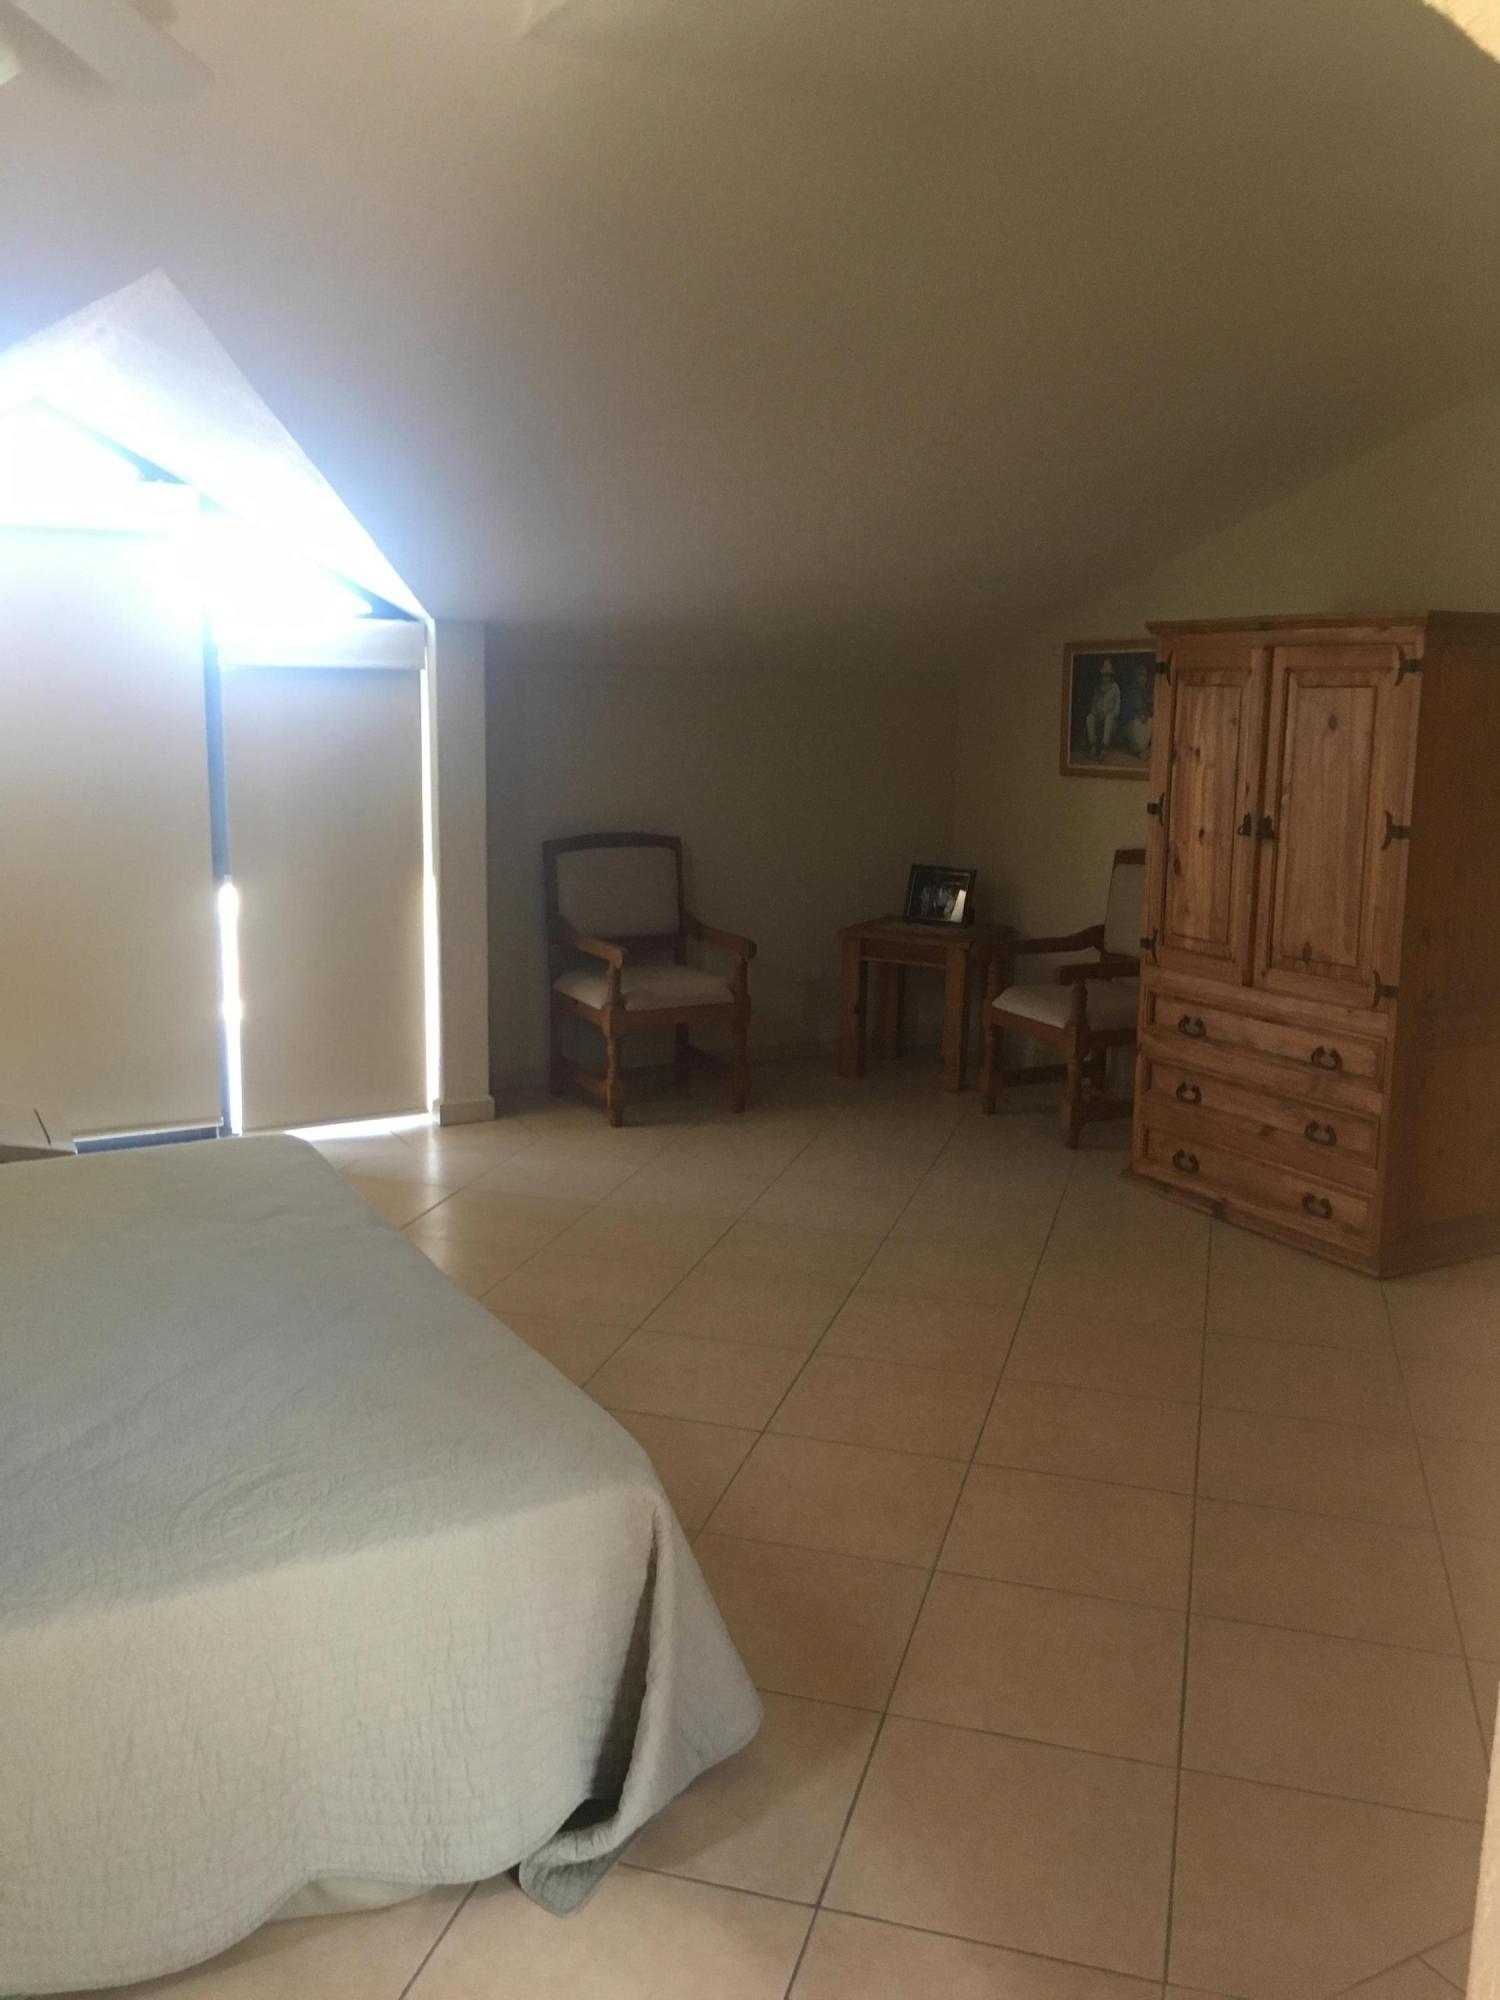 Fase 3 Rtno. Punta Palmillas Villa 7 # 301